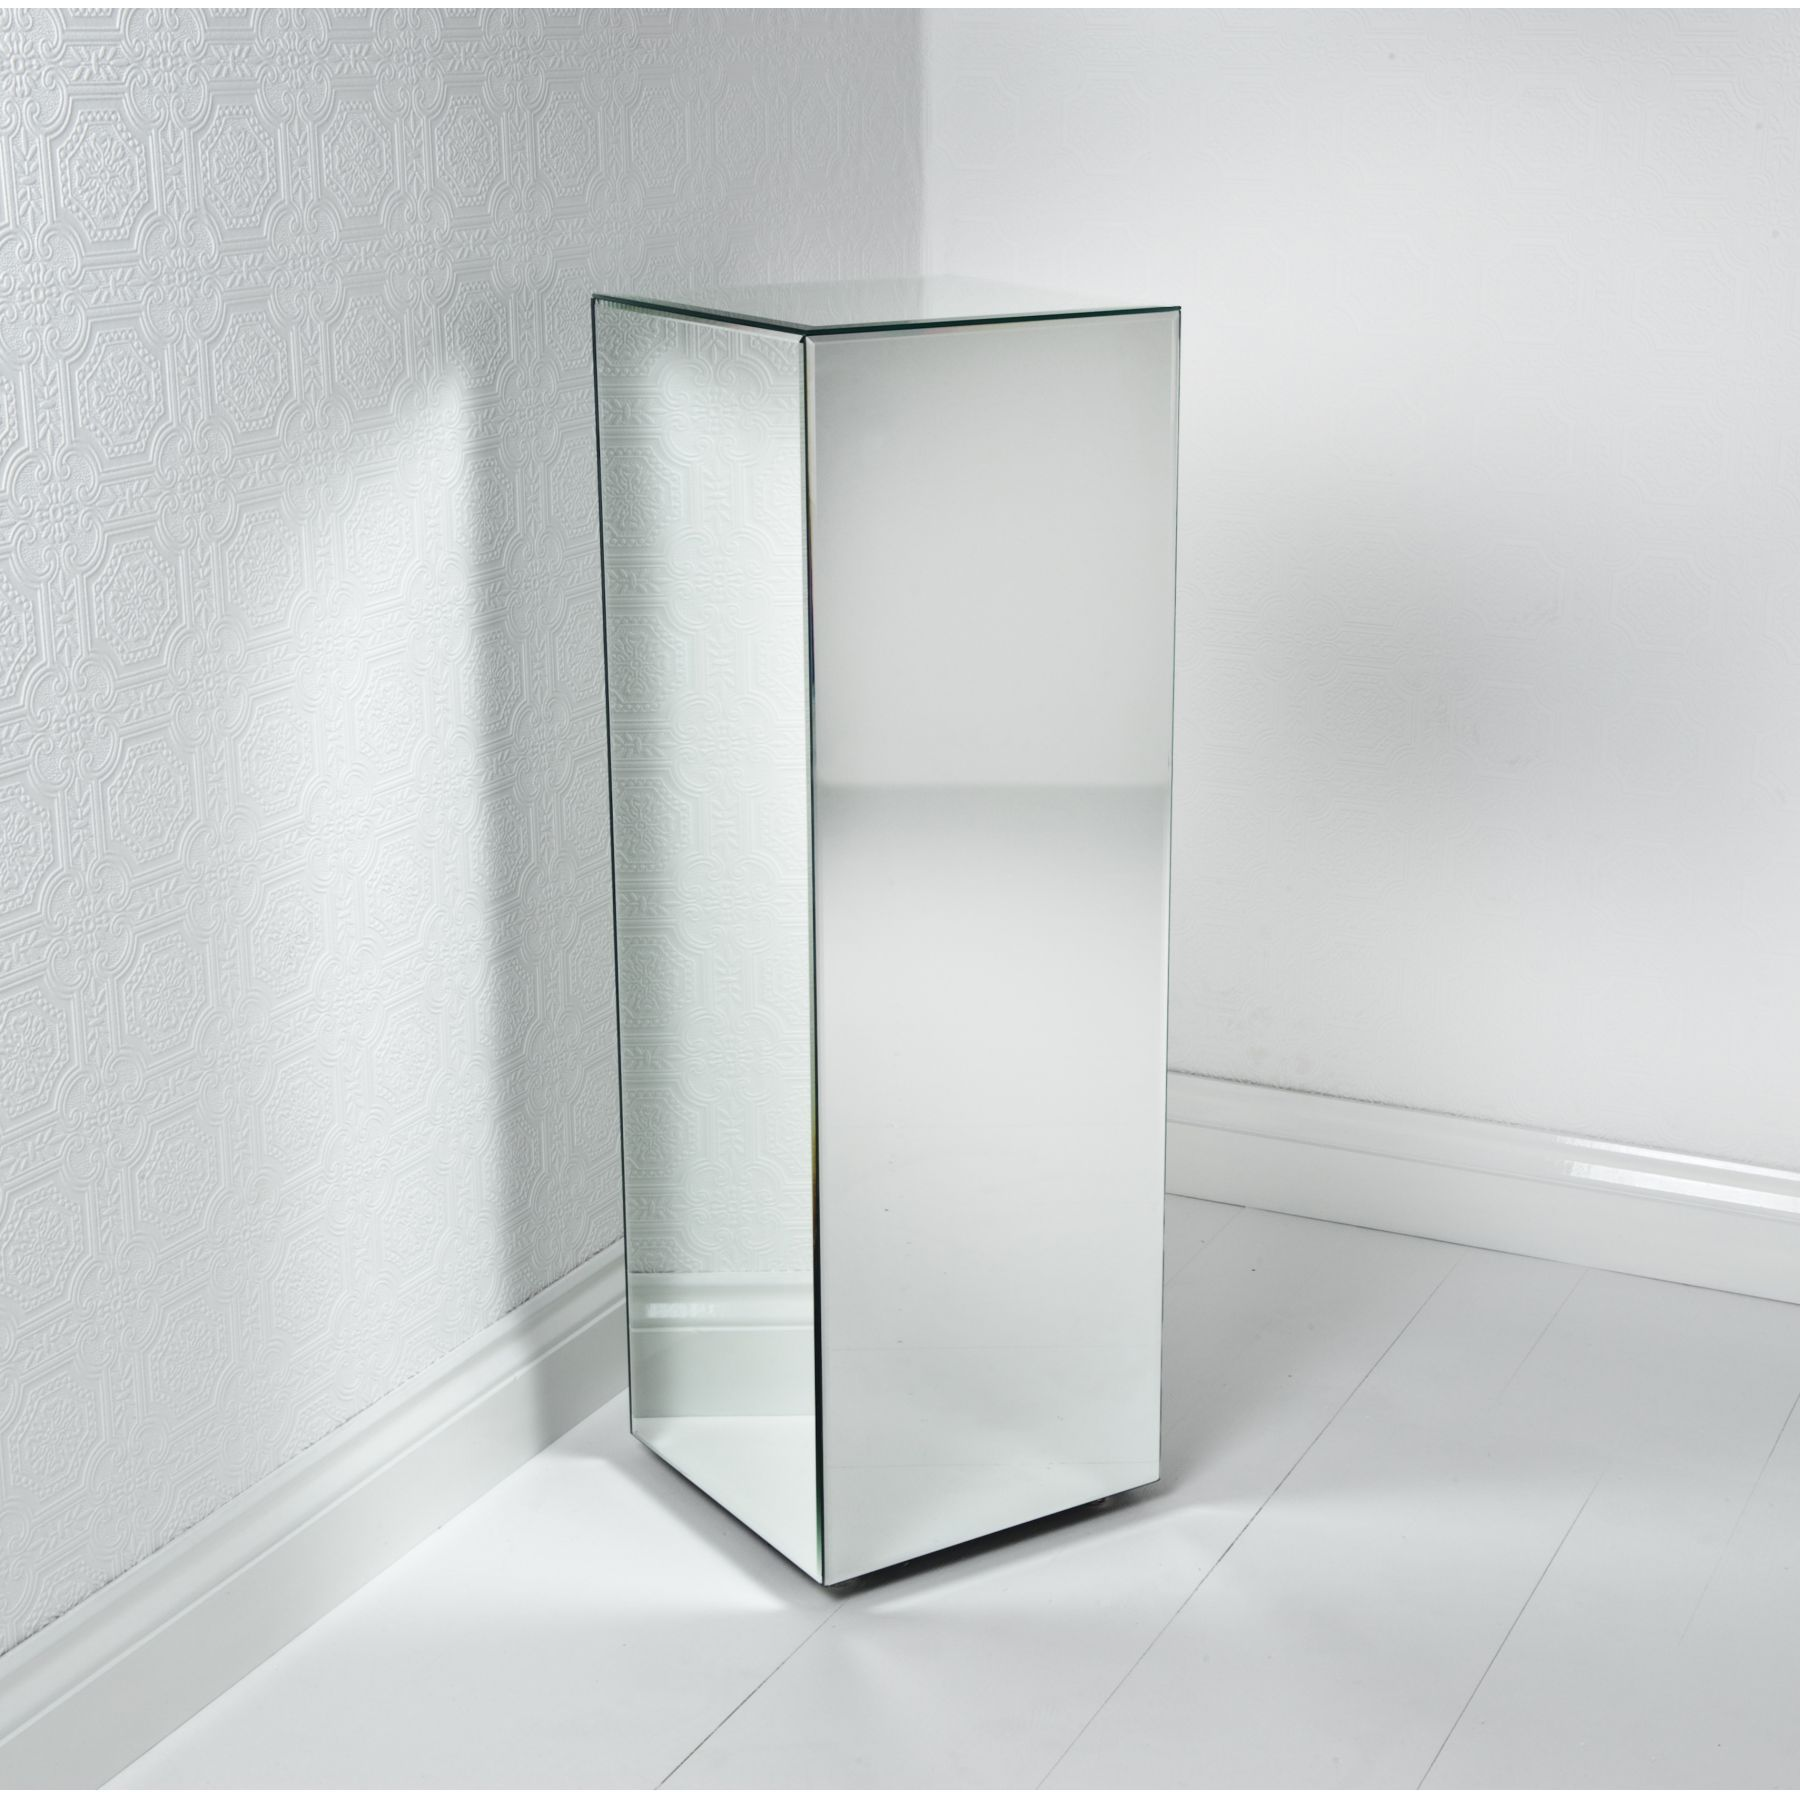 Mirrored Pedestal Column Google Search Board 2